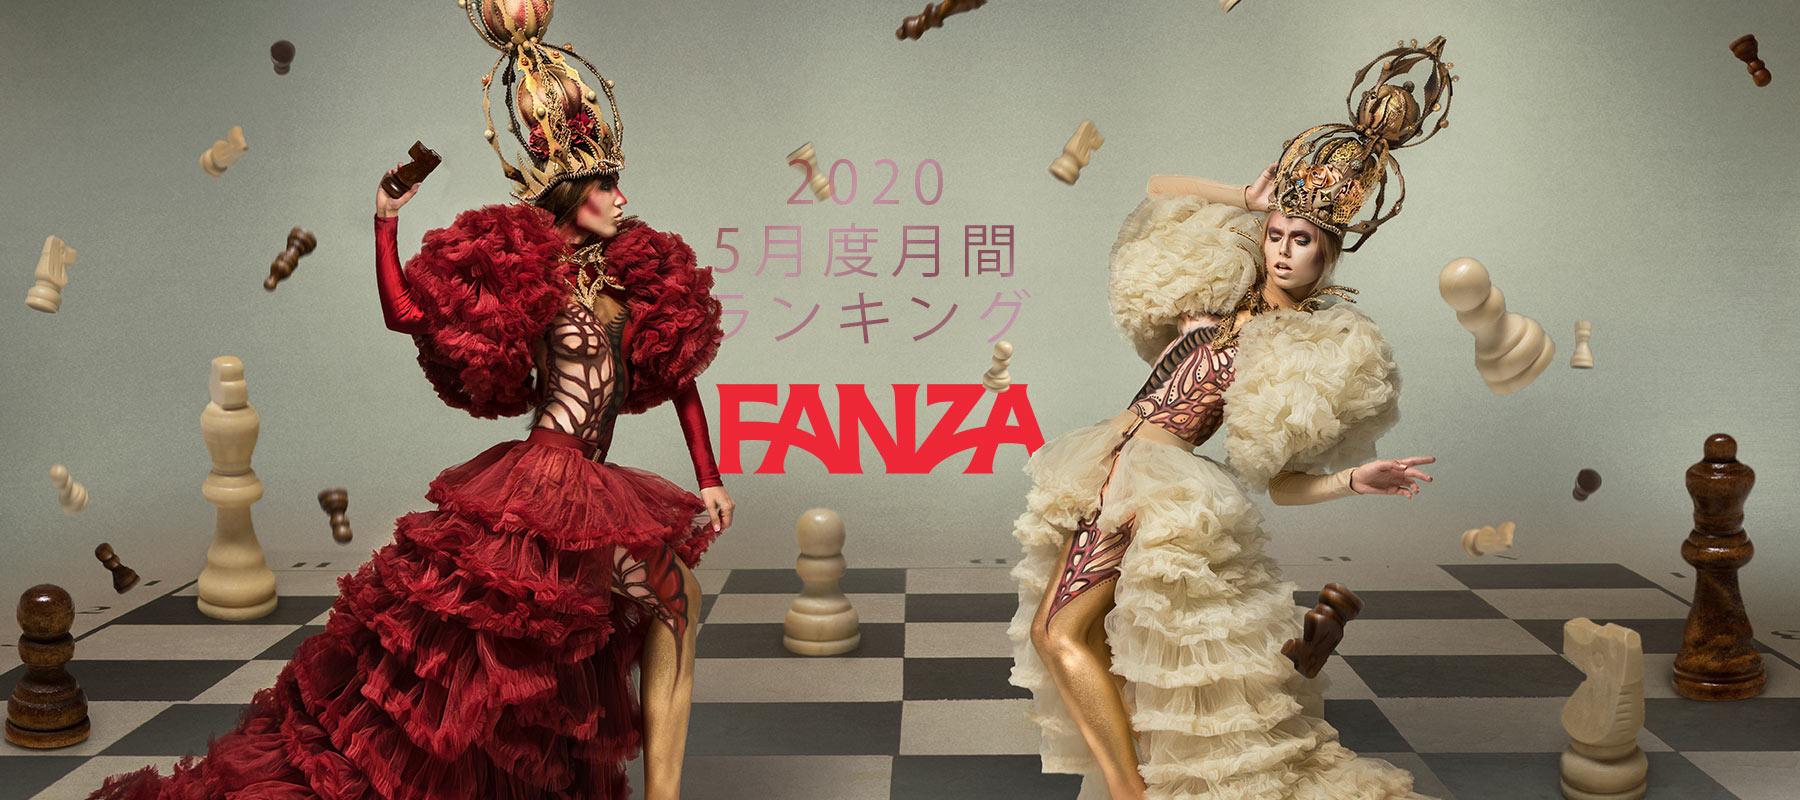 FANZA月間ランキング(2020年5月度)